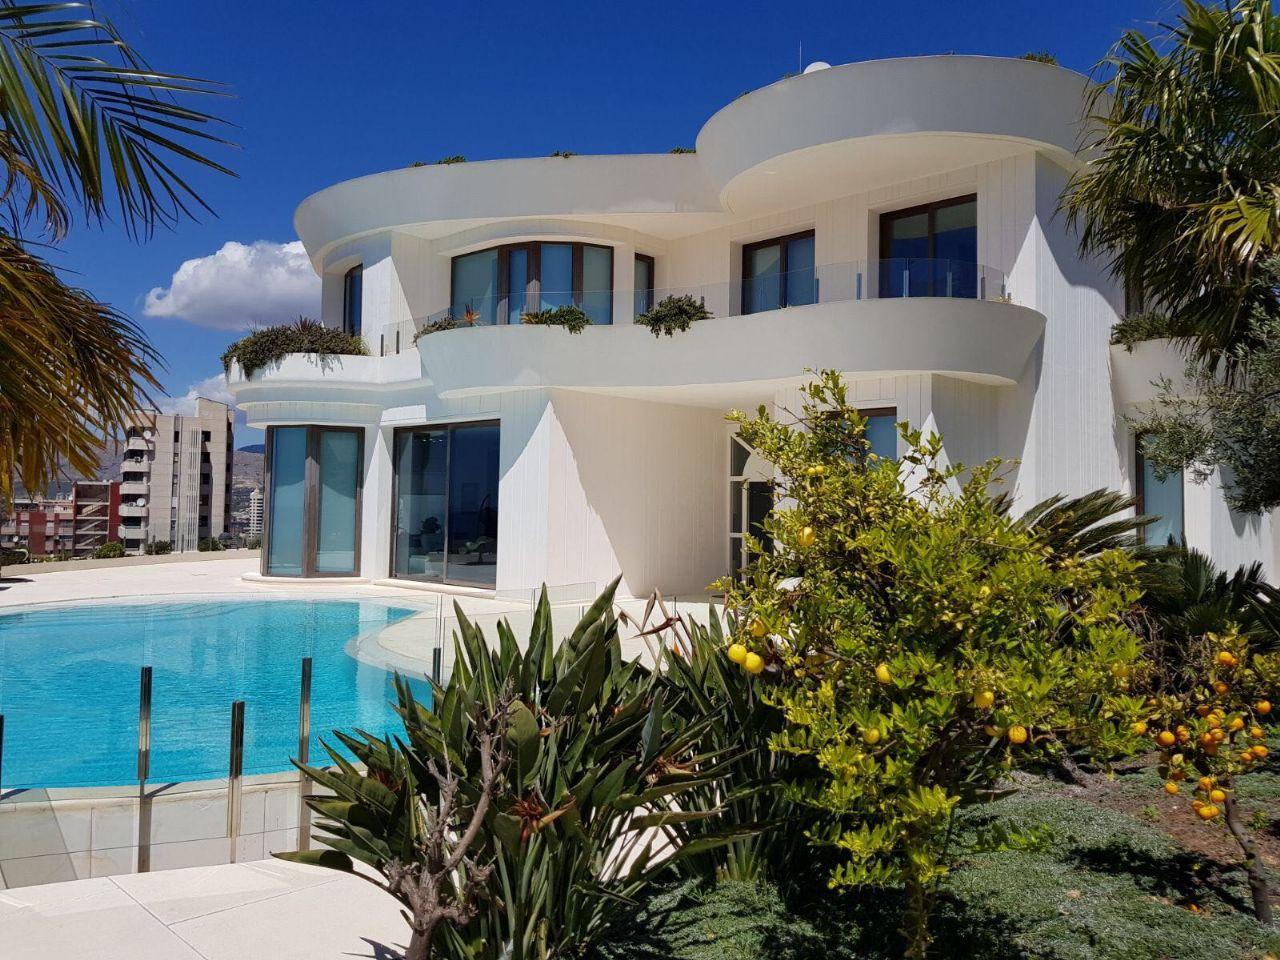 Casa / Chalet en Benidorm, RINCON DE LOIX, venta